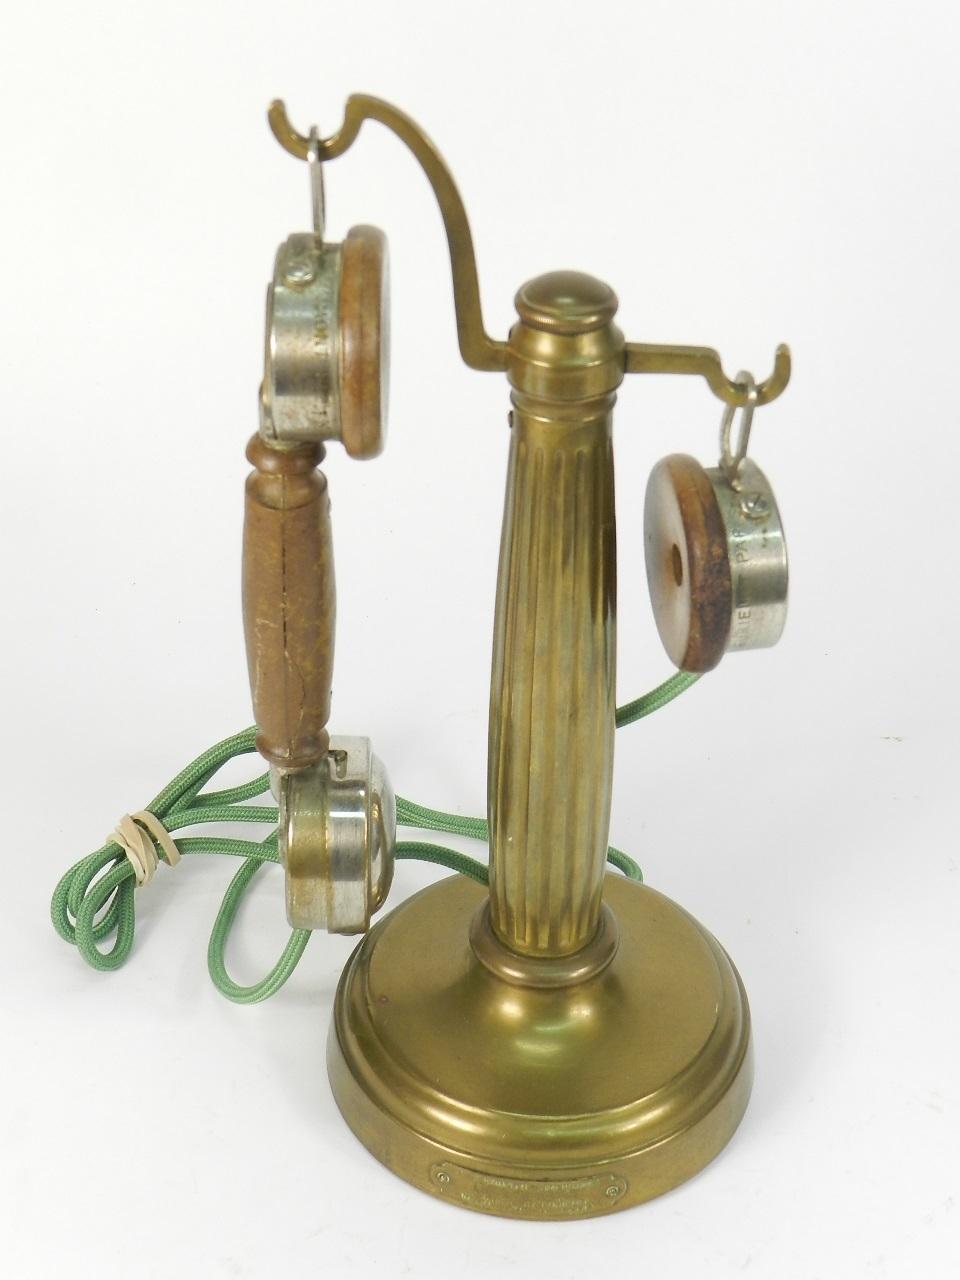 Imagen TELEFONO LATON GRAMMONT AÑO 1920 41236